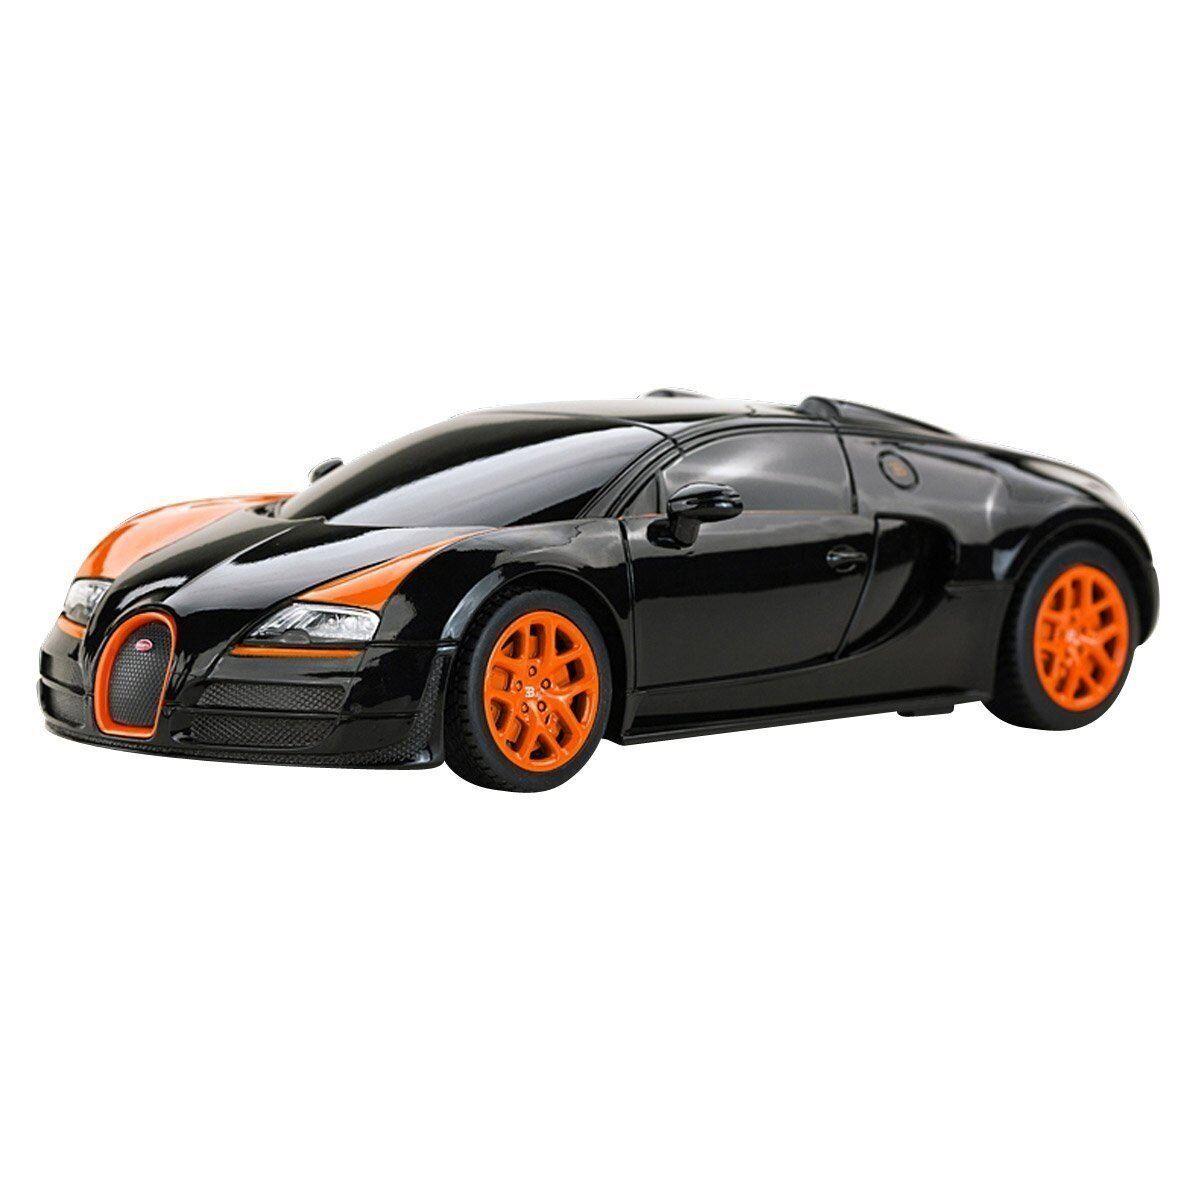 Wallpaper Bugatti Veyron Grand Sport Vitesse Sports Car: 1:14 Bugatti Veyron 16.4 Grand Sport Vitesse Radio Remote